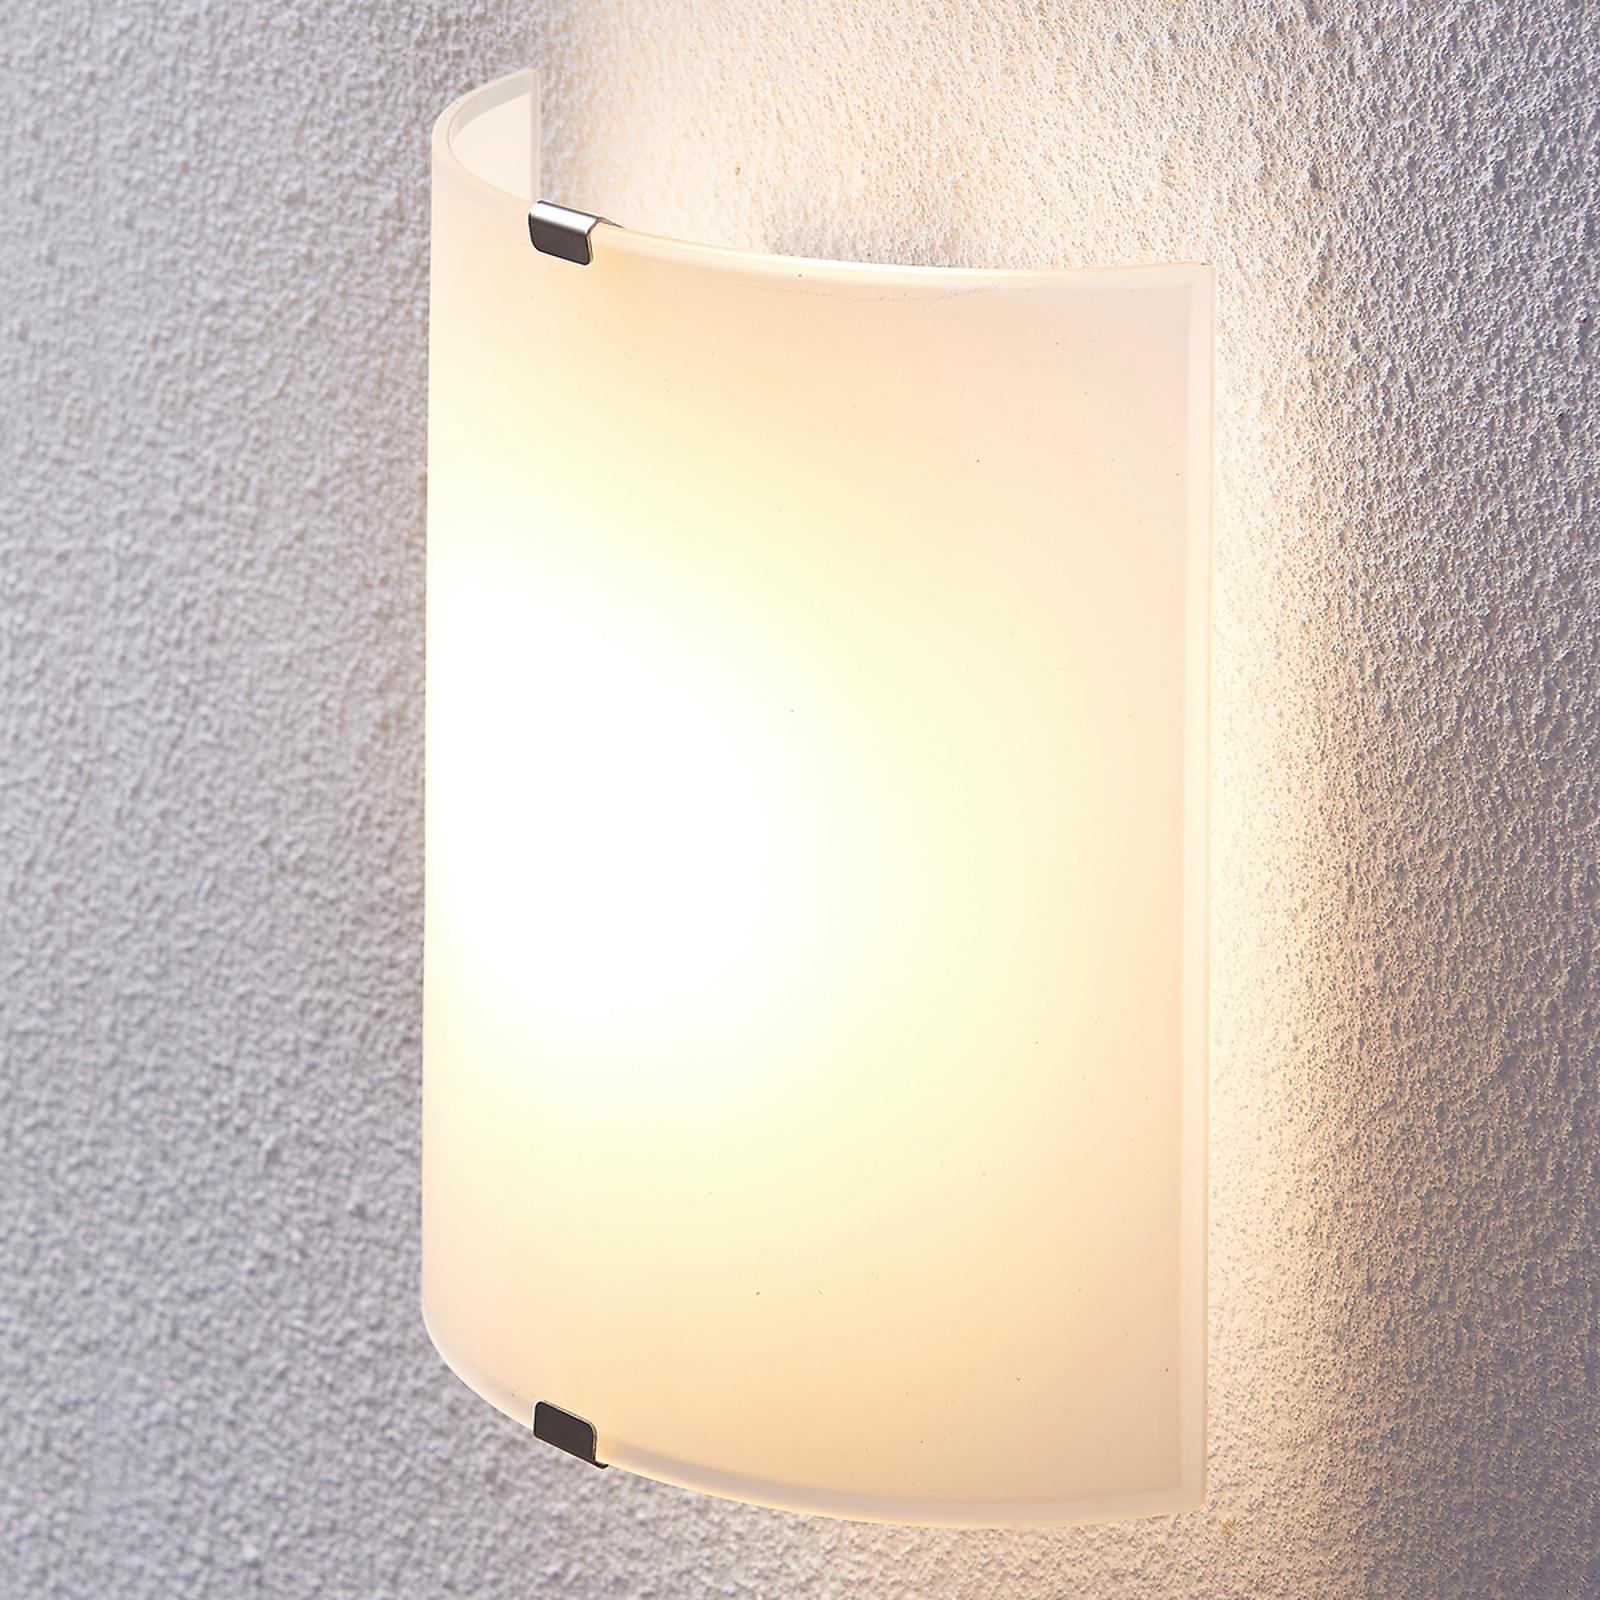 Halvrund LED-vegglampe Helmi med glasskjerm